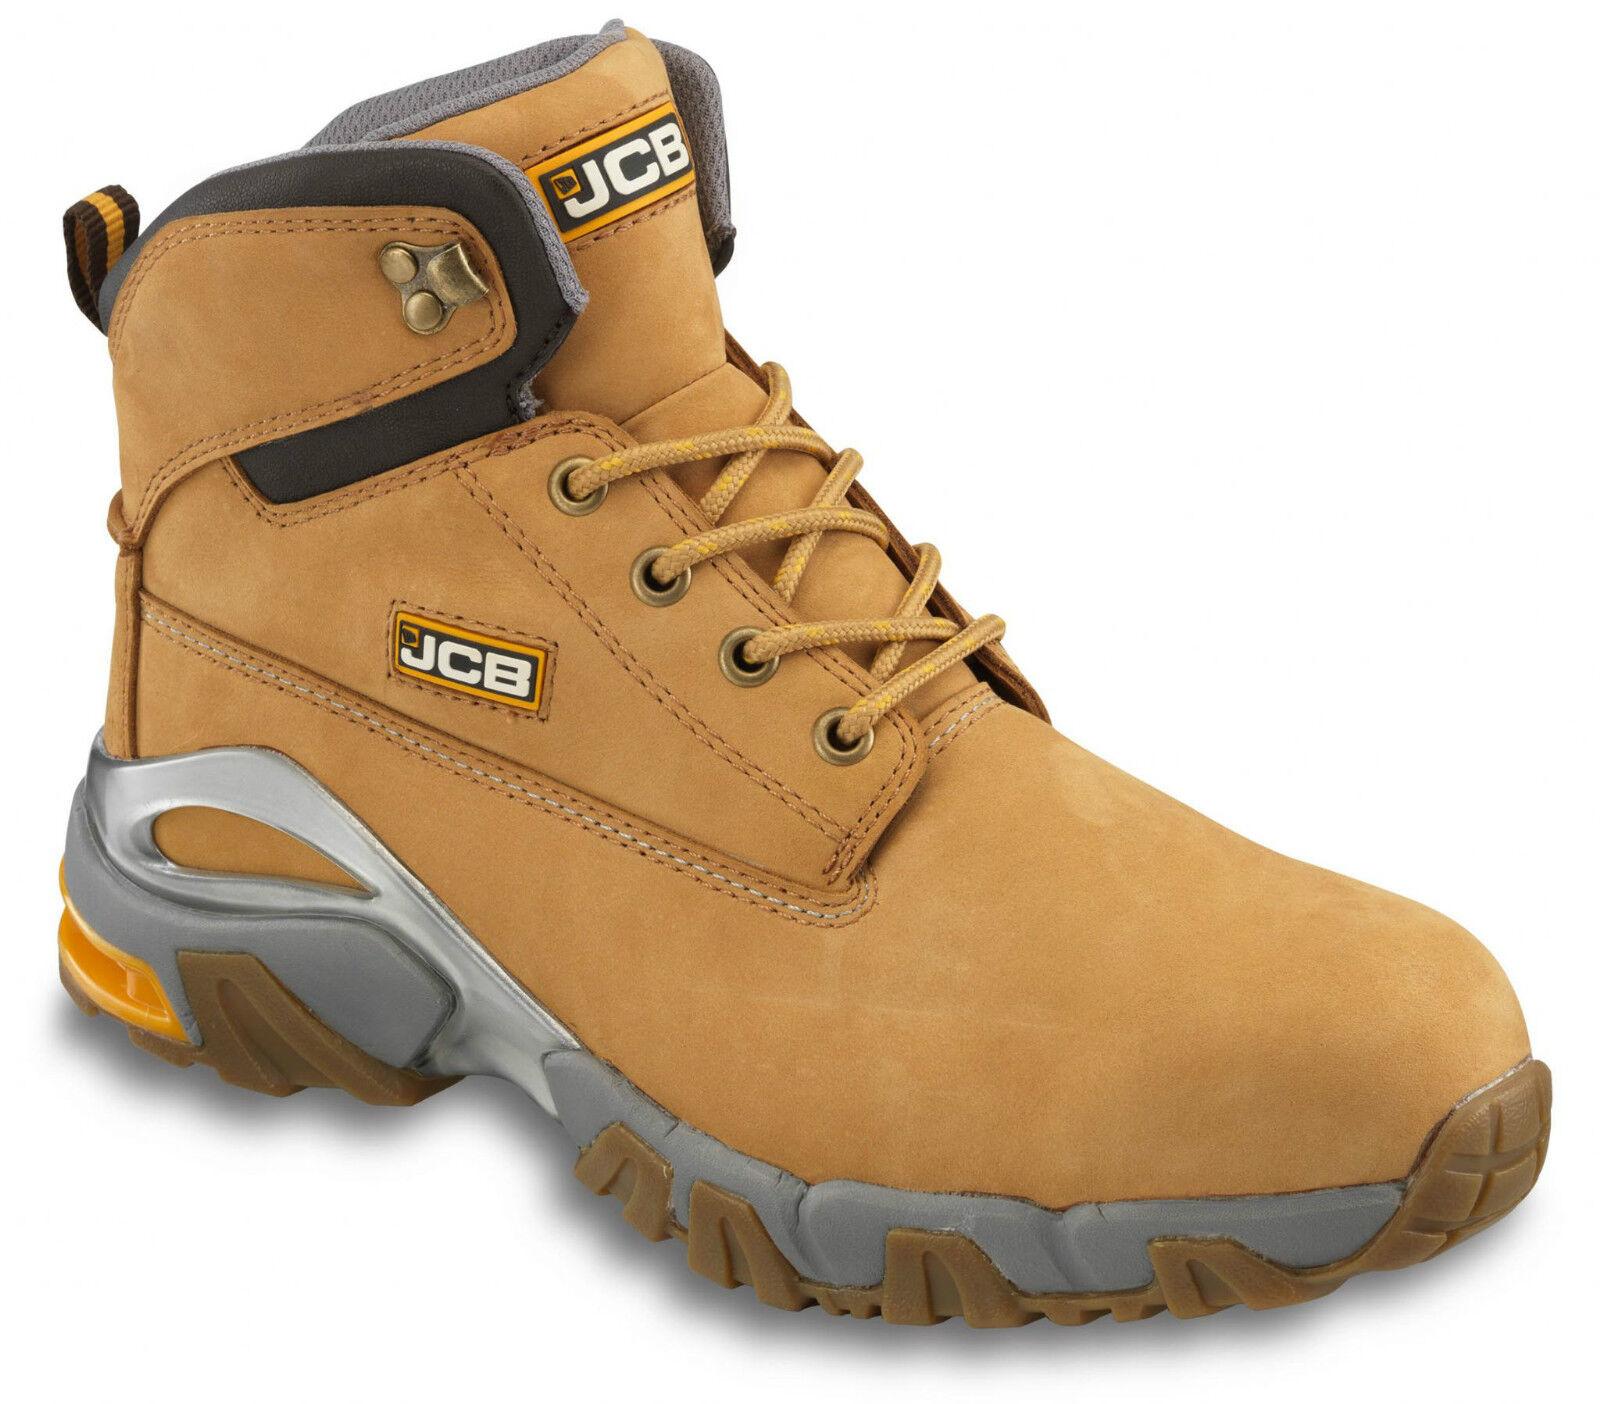 JCB 4X4 Safety Waterproof Work Boots Tan Honey (Sizes 7-12) Men's Wider Fit